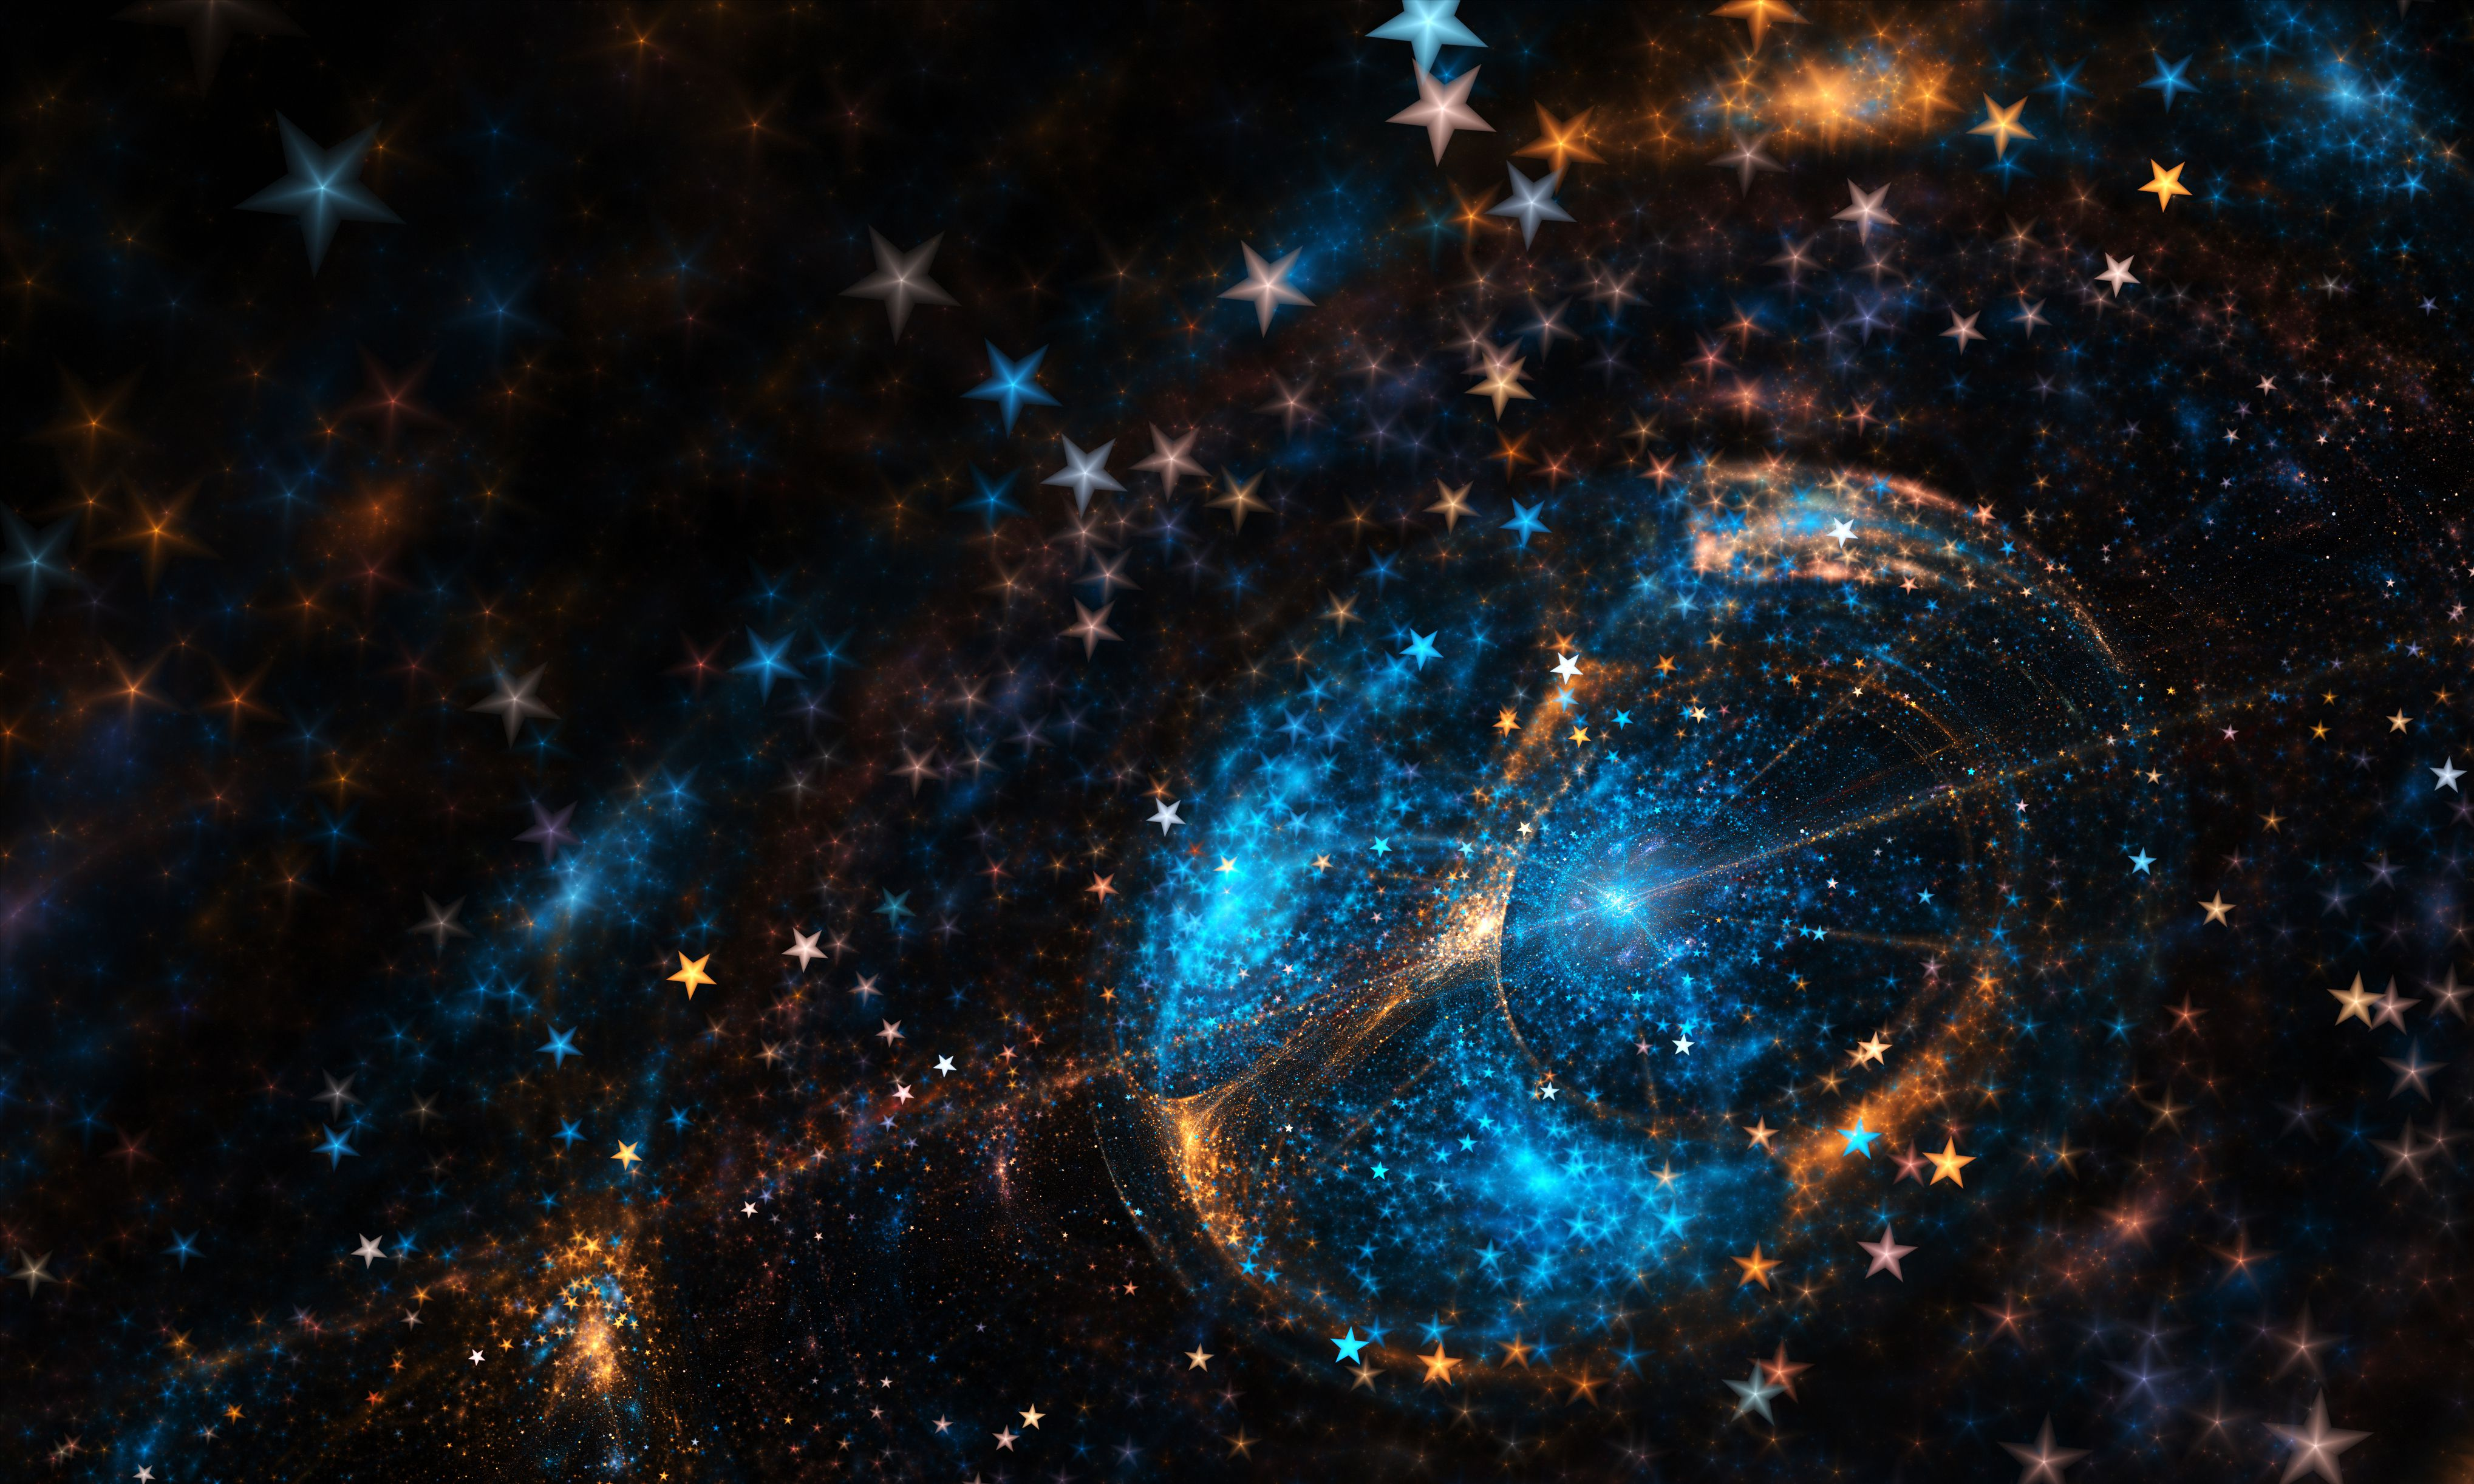 The Star Jupiters